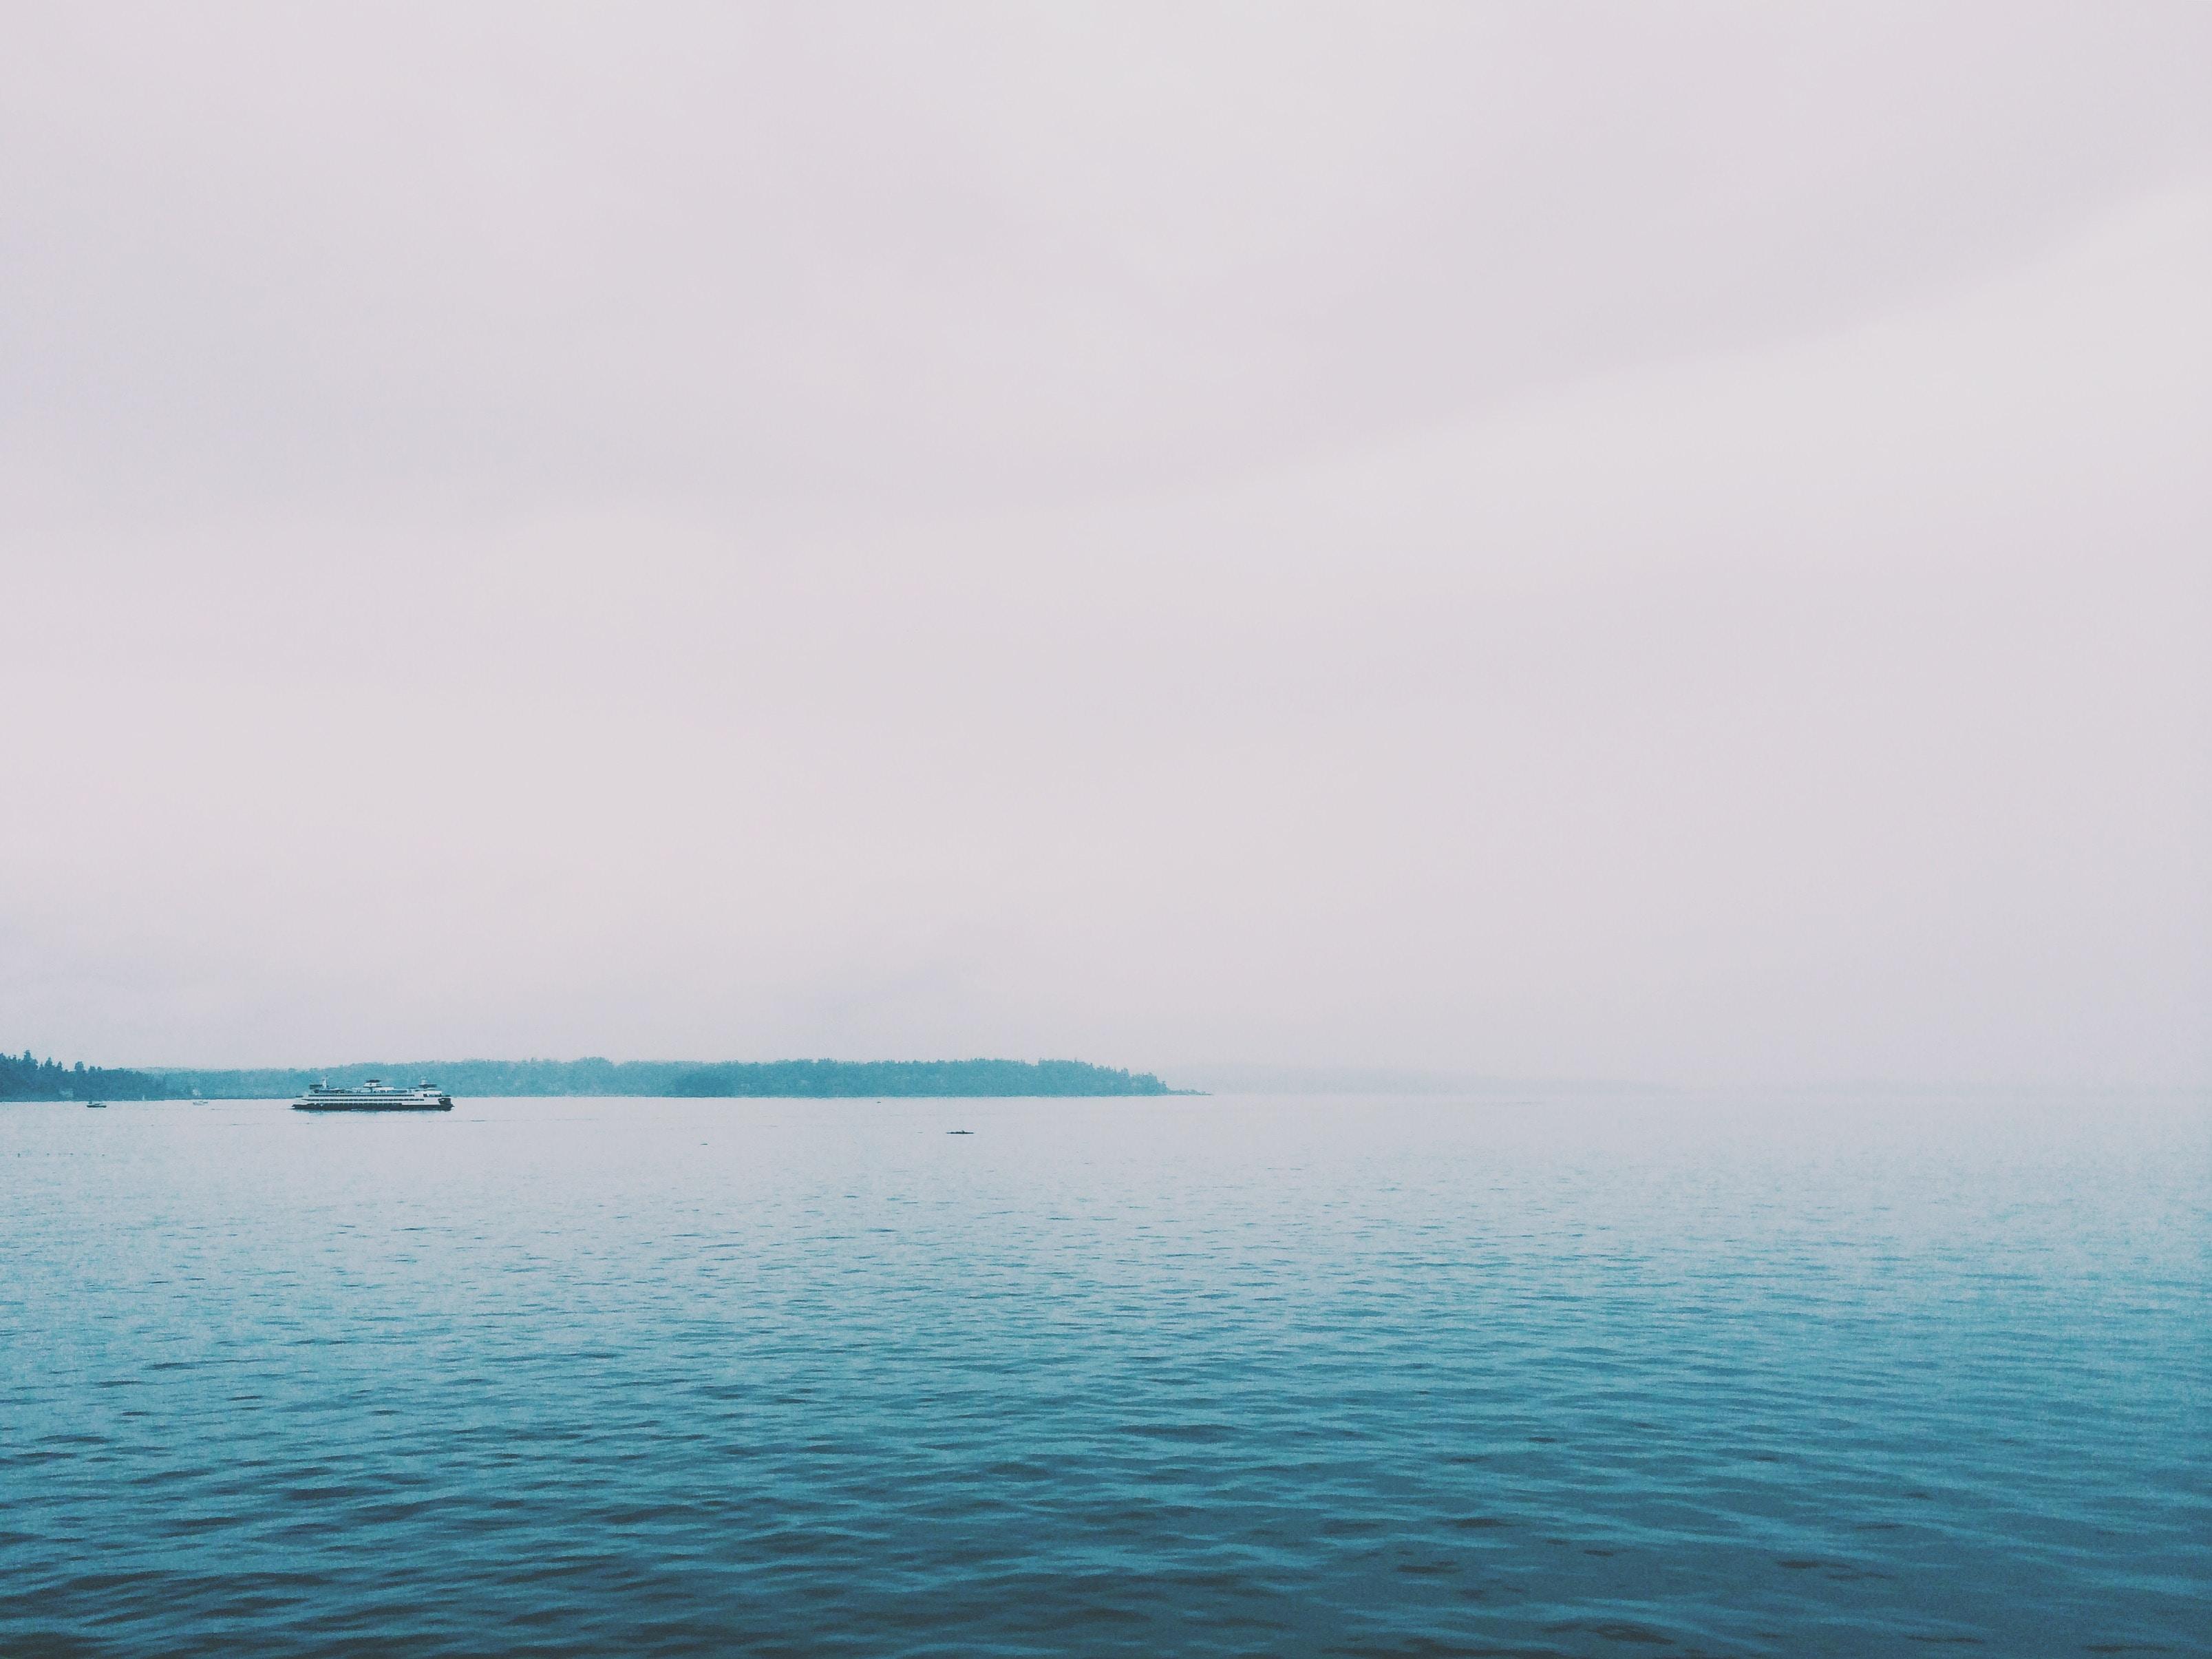 blue sea under gray sky